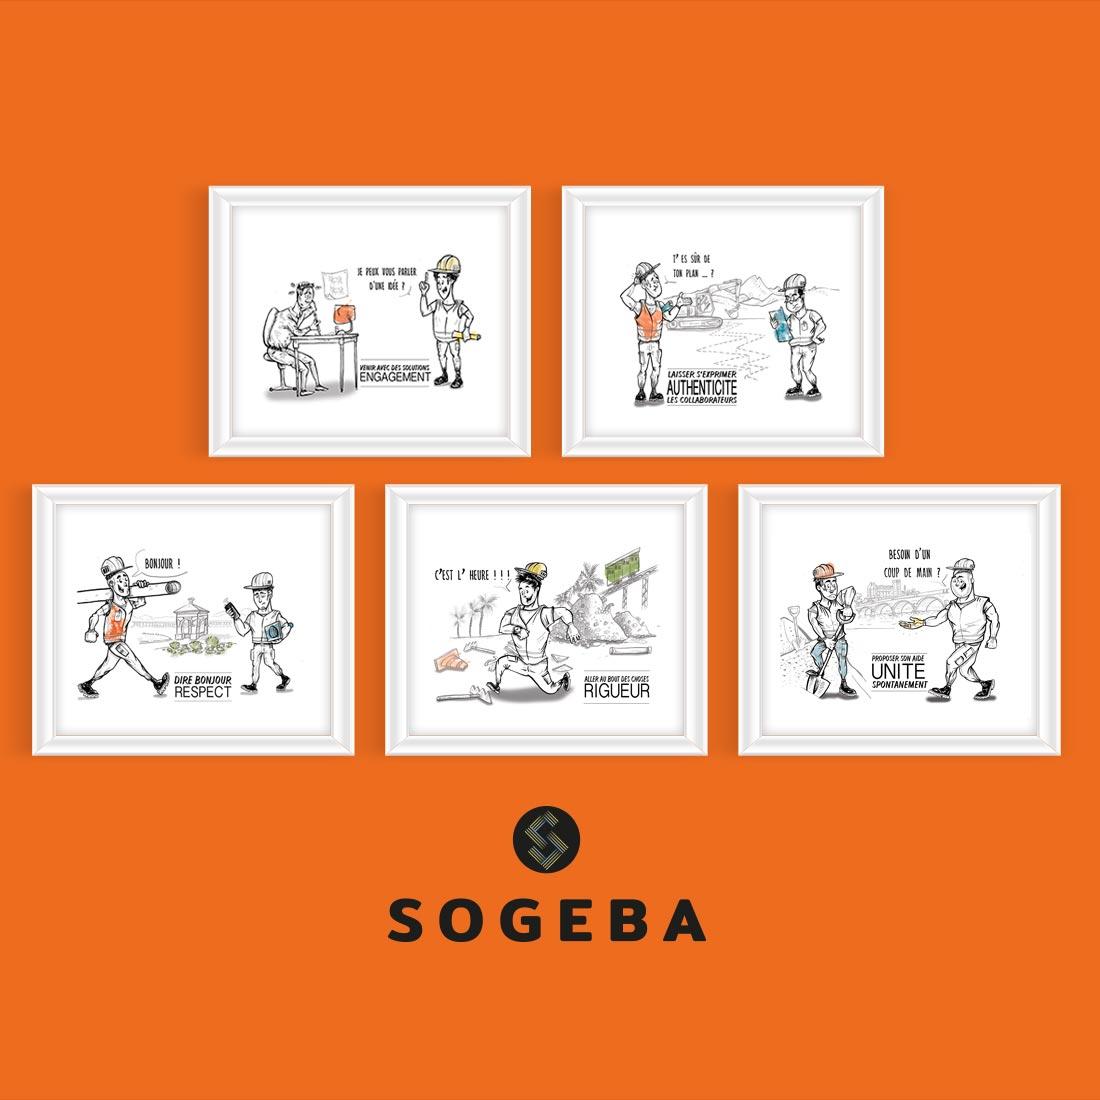 sogeba_tableaux_valeurs_03